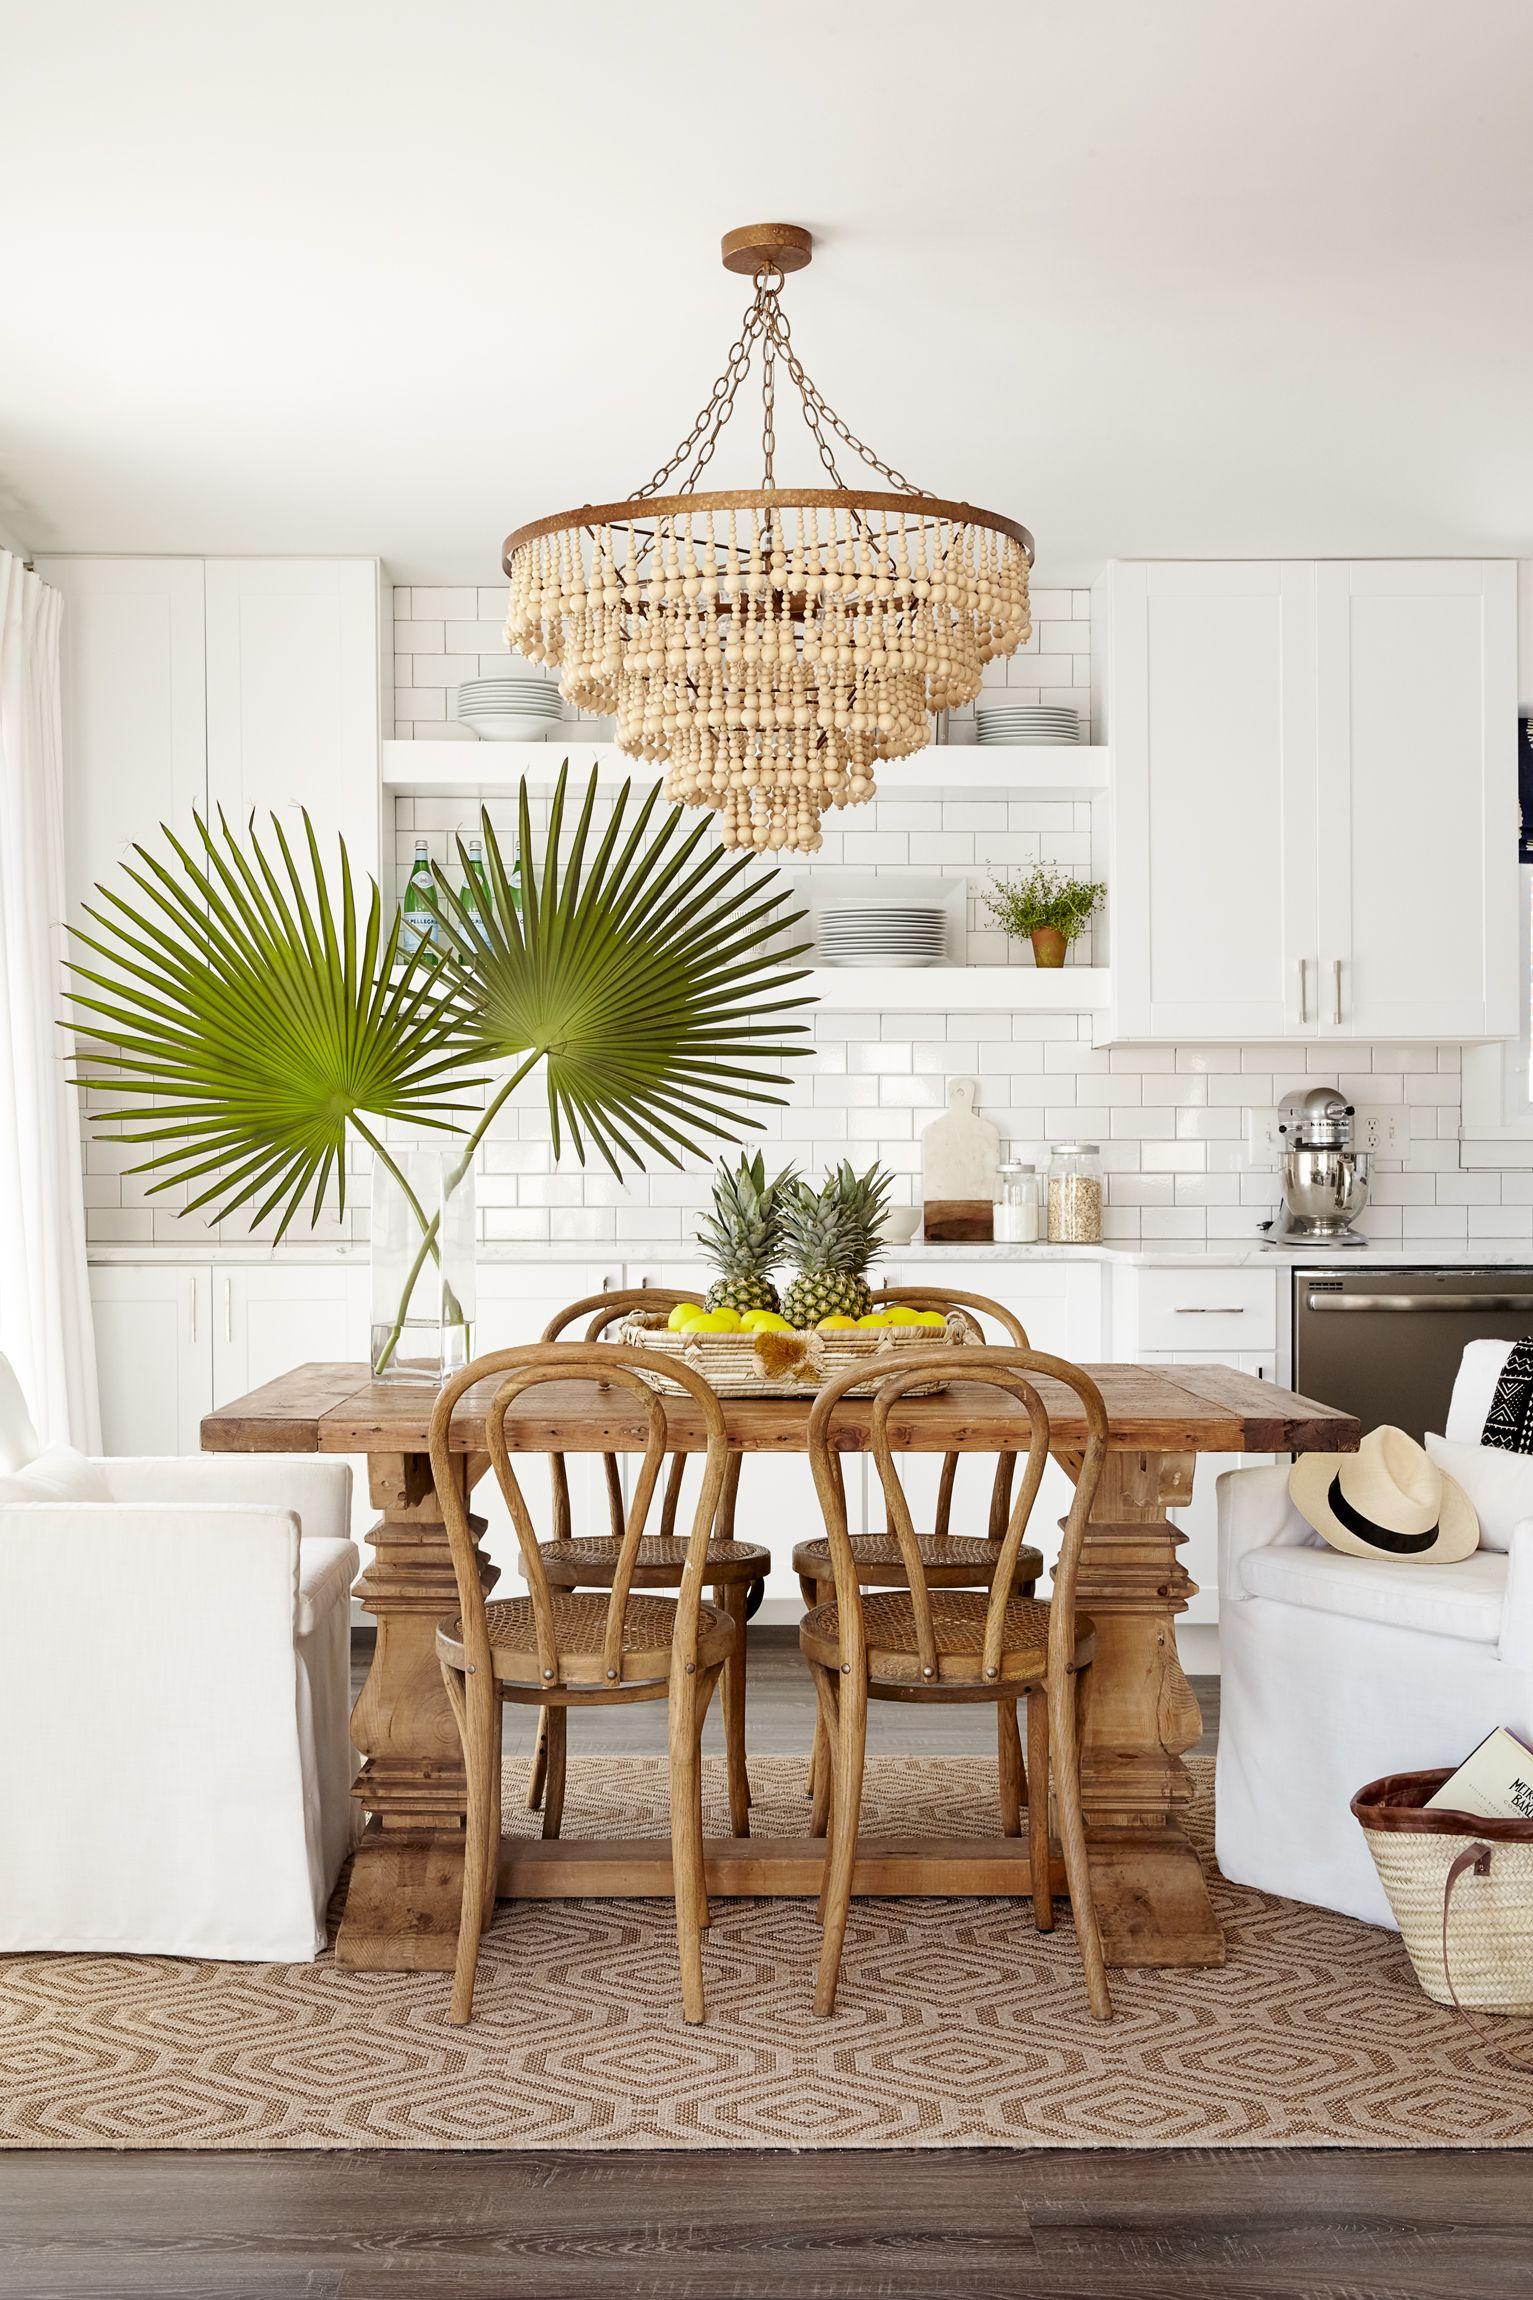 Stephaniekrausdesigns Tropical Home Decor Tropical Kitchen Dining Room Decor Bungalow dining room decorating